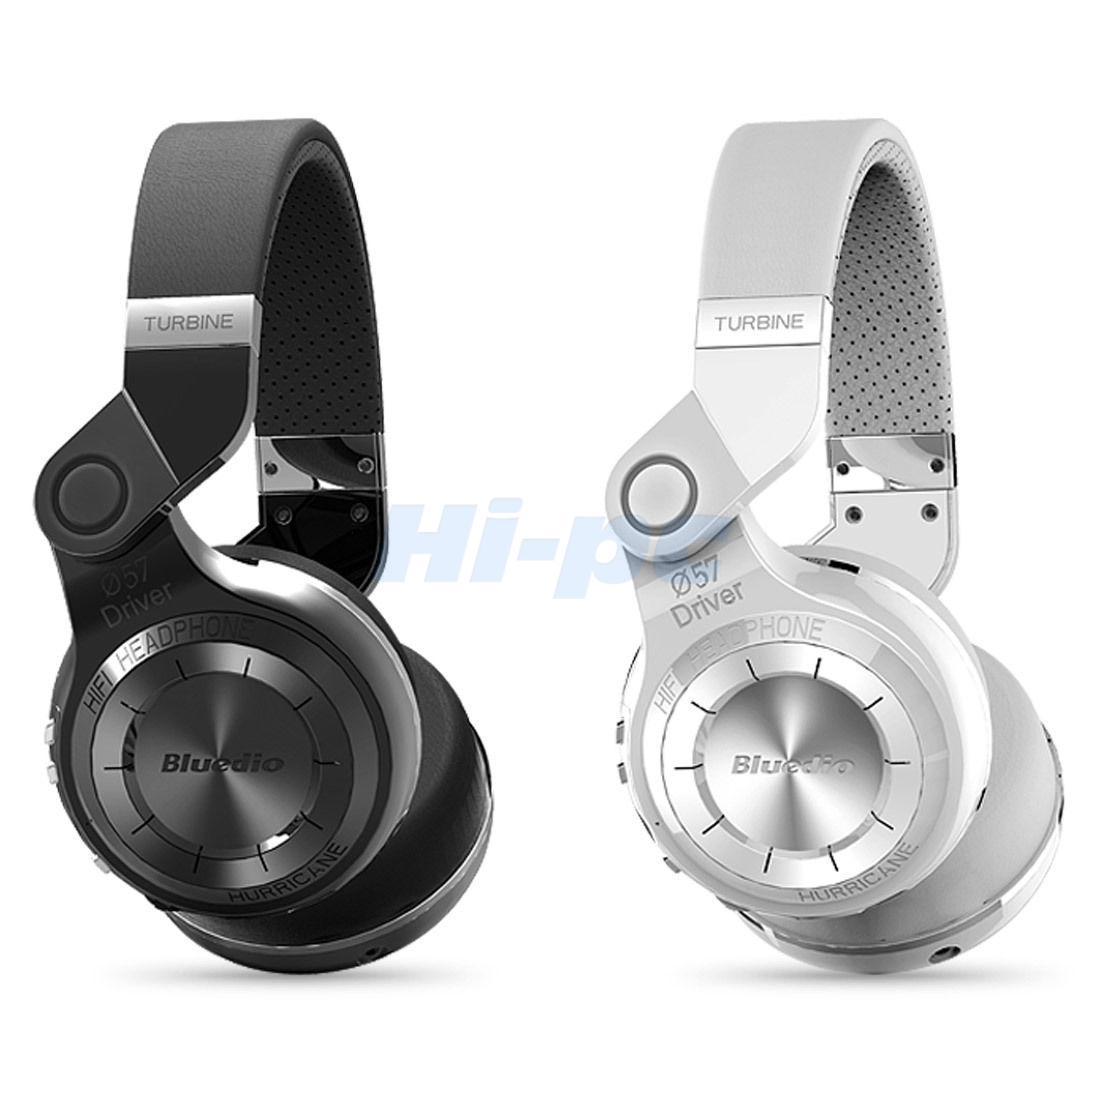 Bluedio T2 Bluetooth 4.1 Stereo Wireless Headset Headphone For IPhone Samsung LG